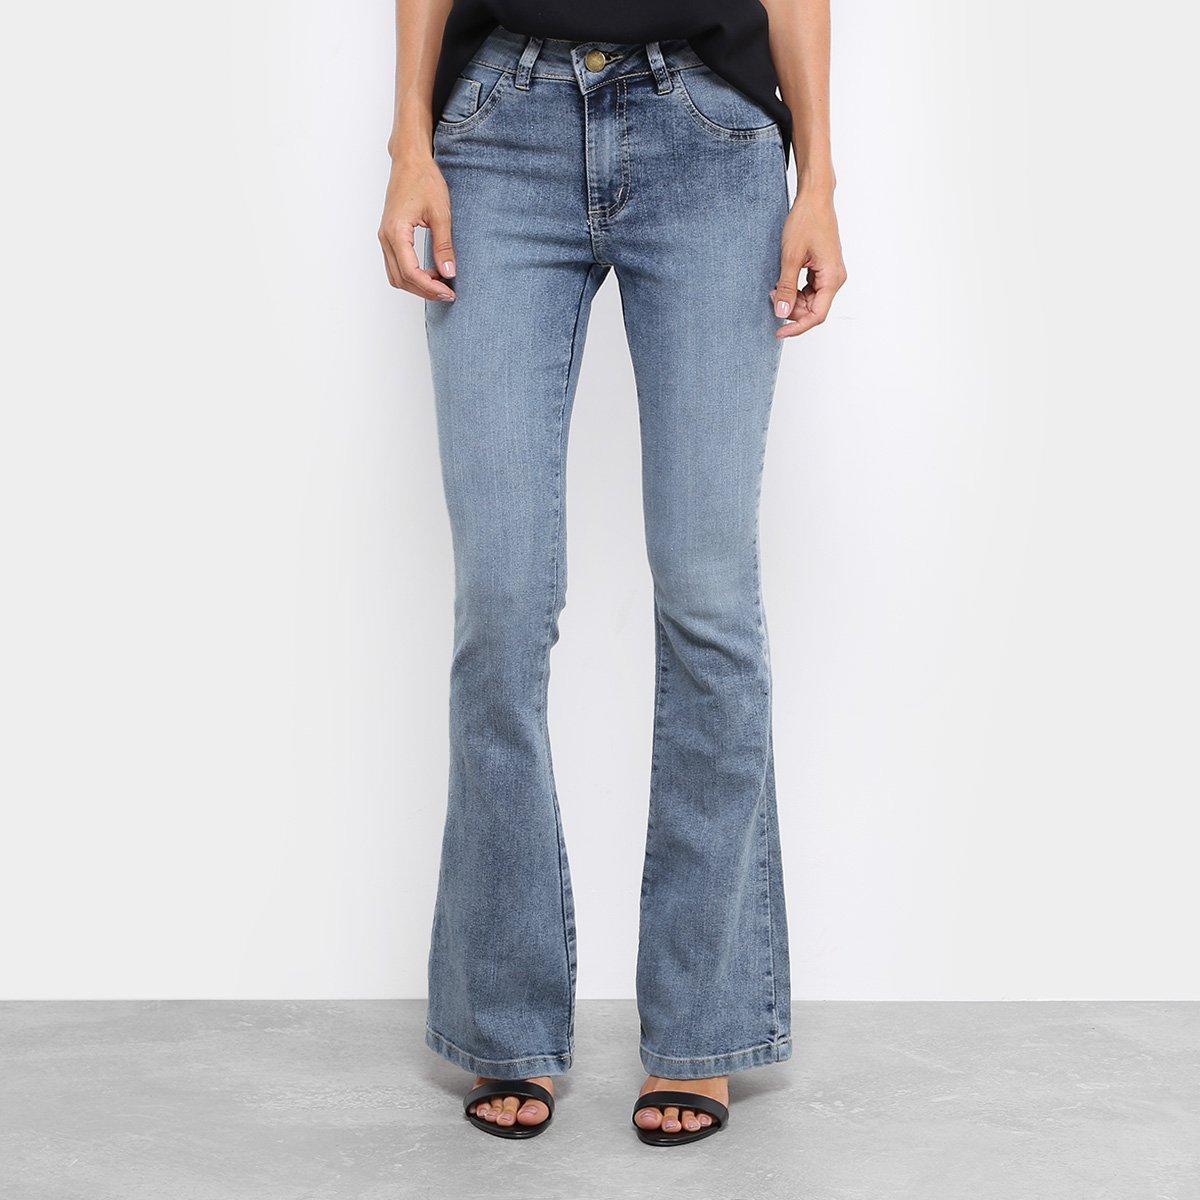 Calça Jeans Flare Coffee Estonada Cintura Média Feminina - Compre ... 96533f3e8c